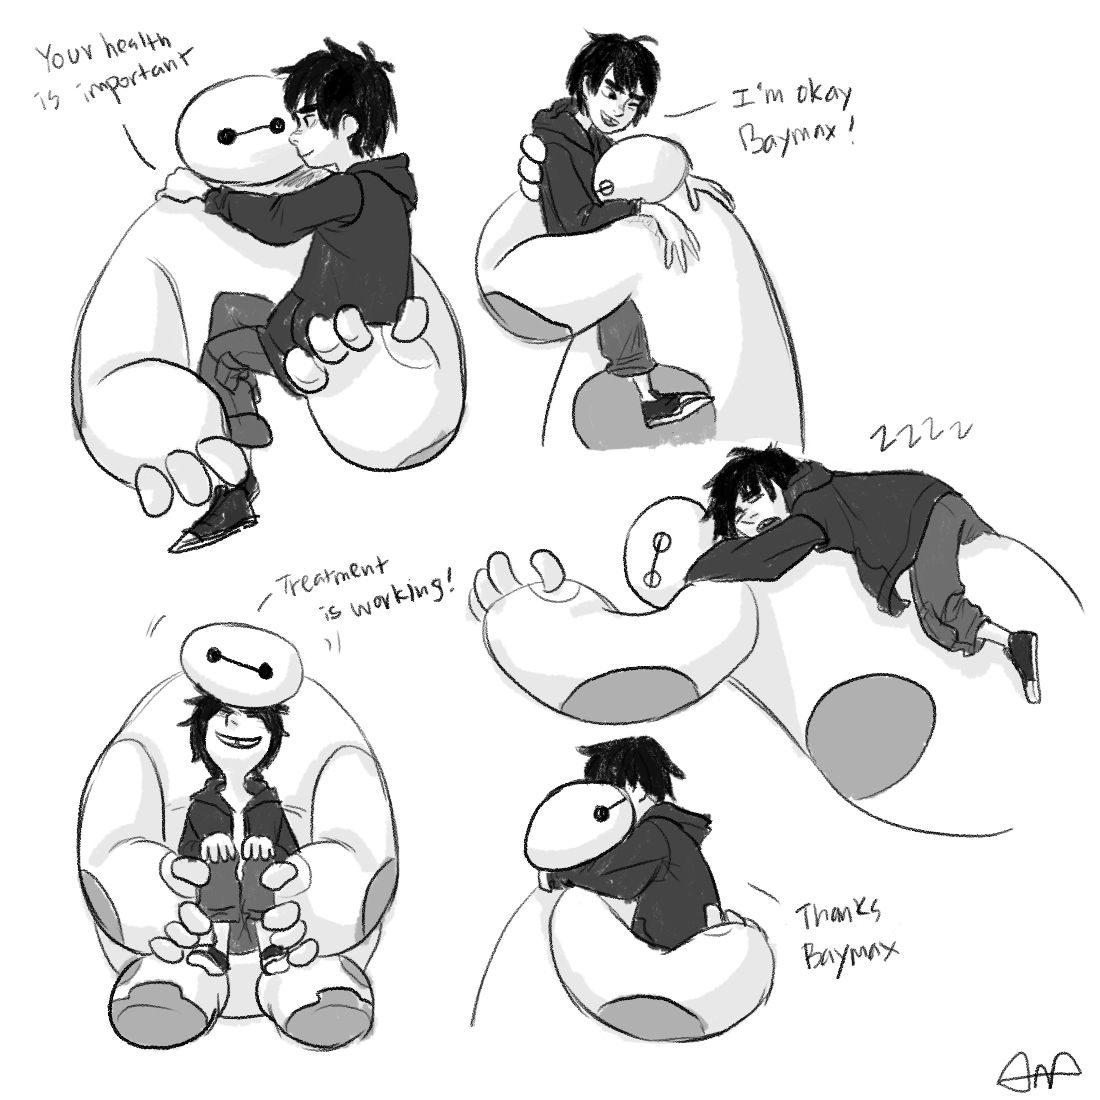 20150125 Baymax & Hiro Hugging Series * used reference